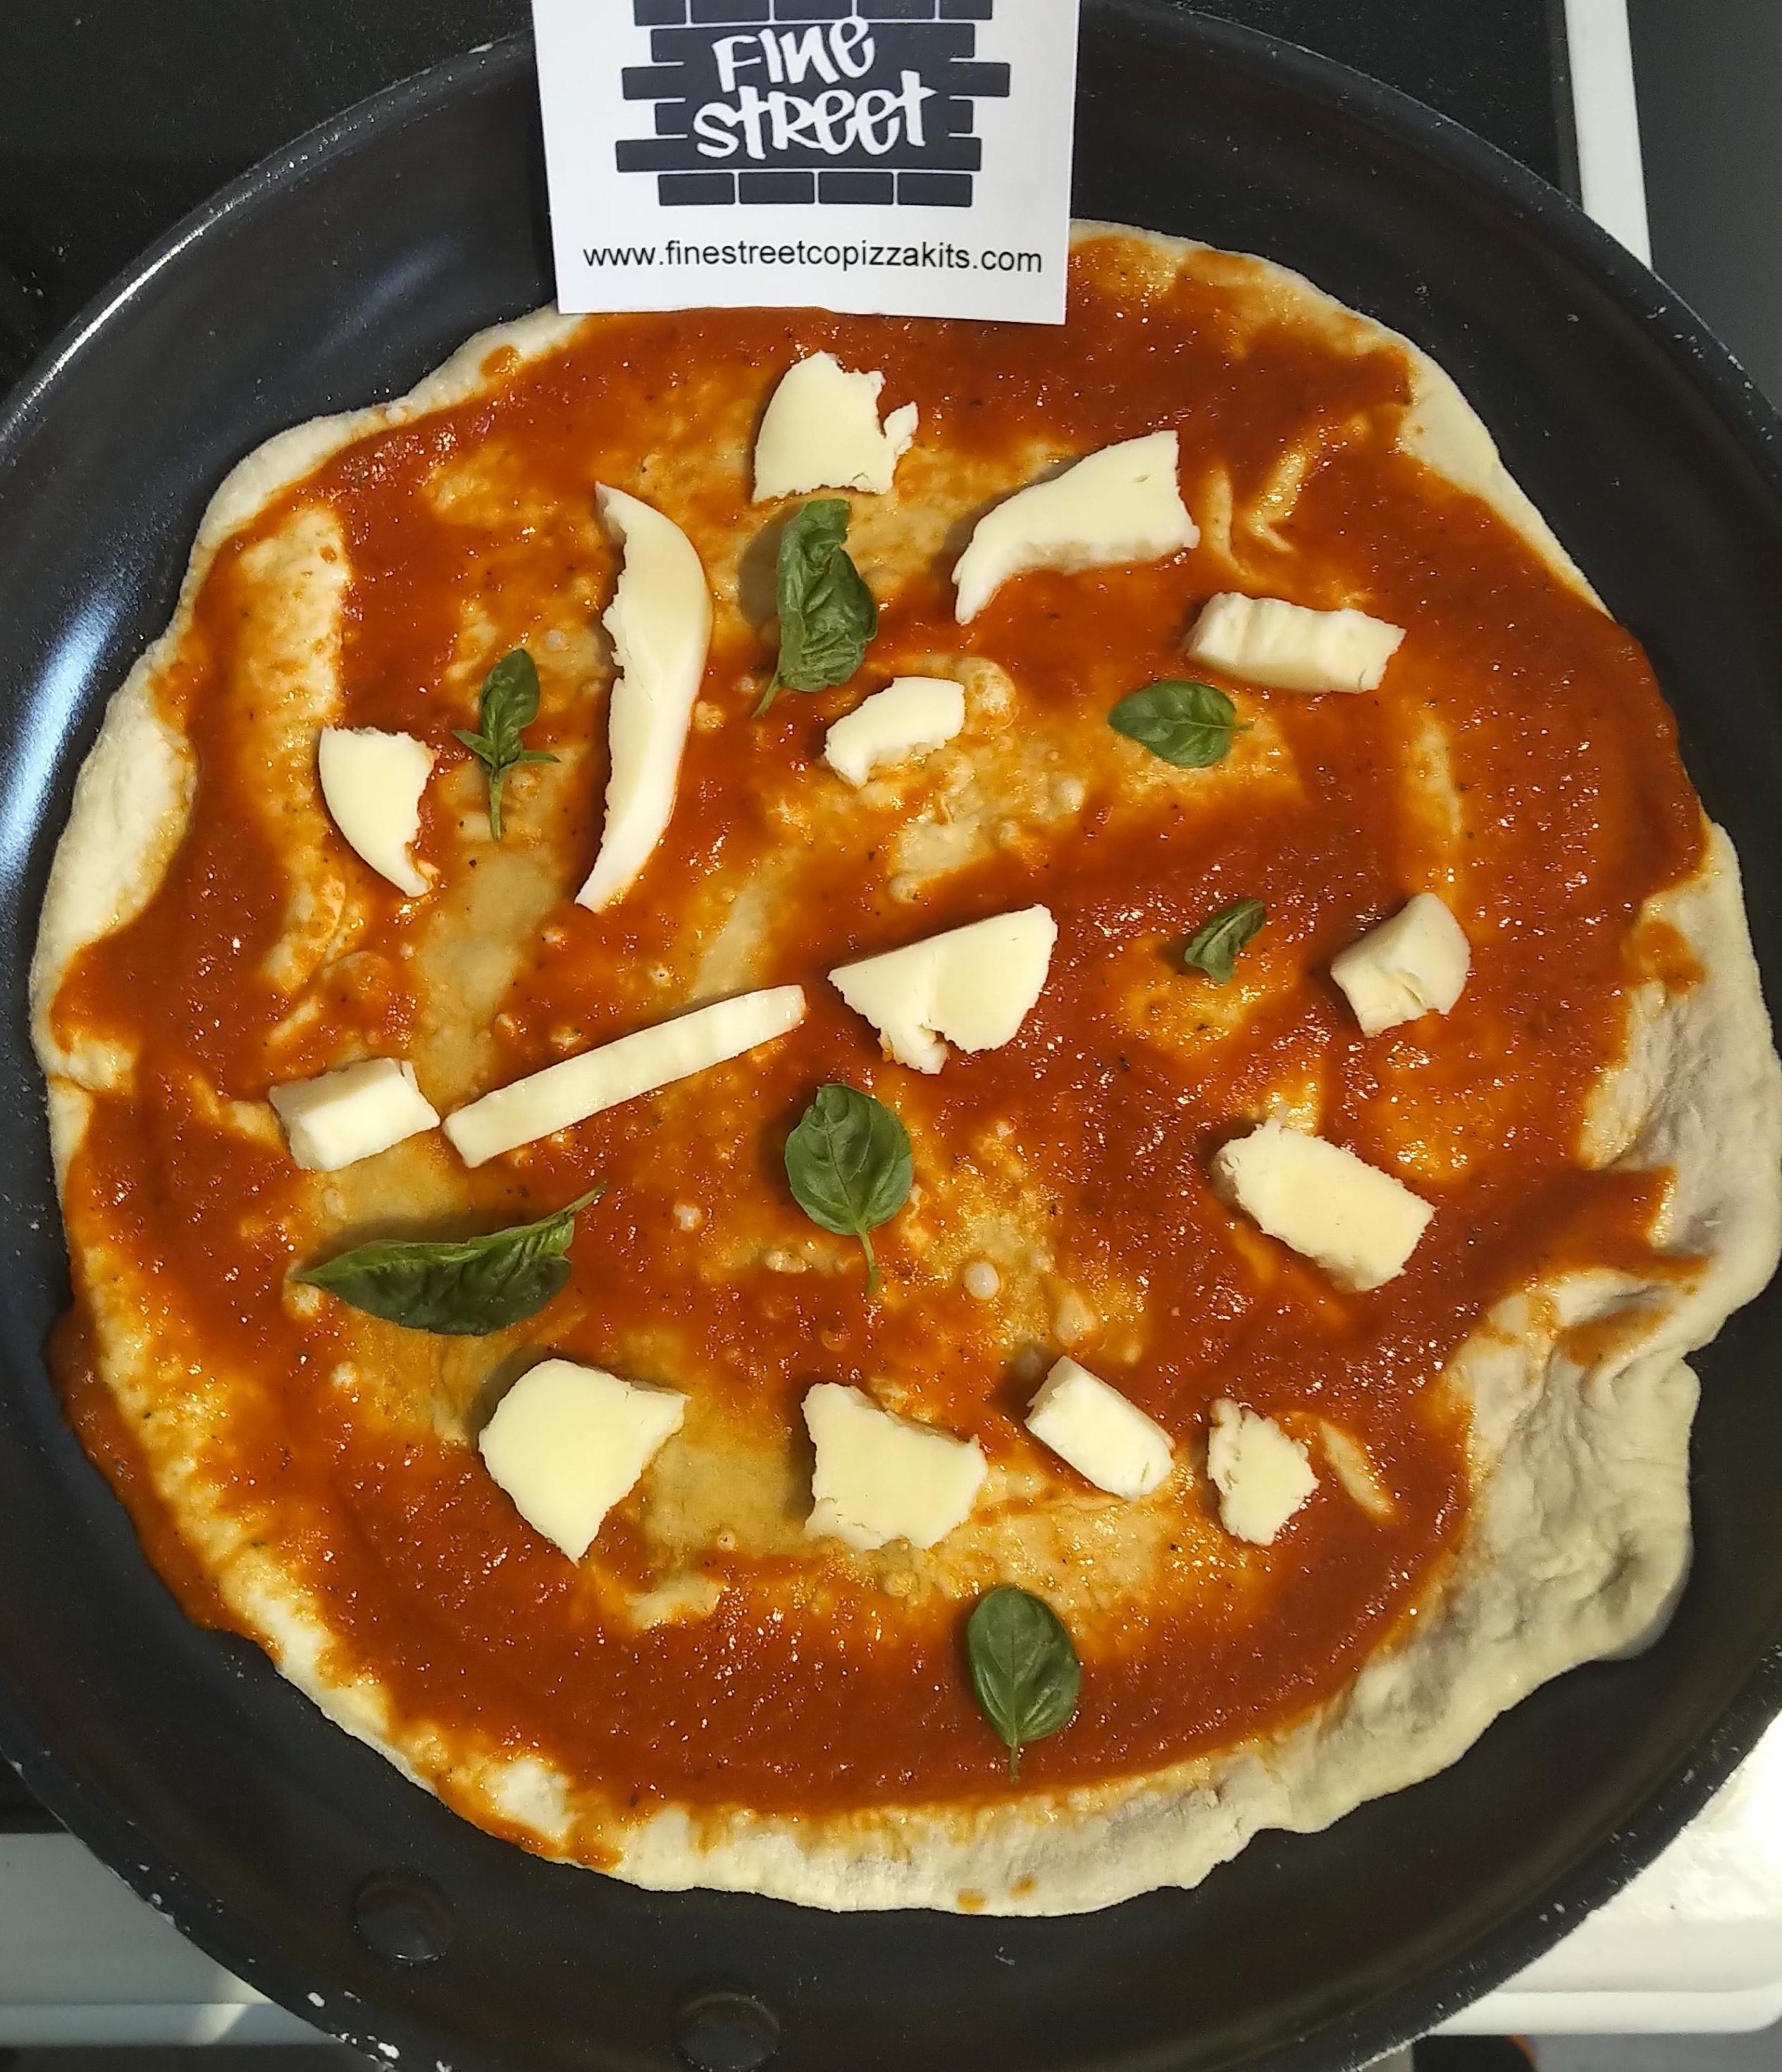 PizzaKit6.jpg